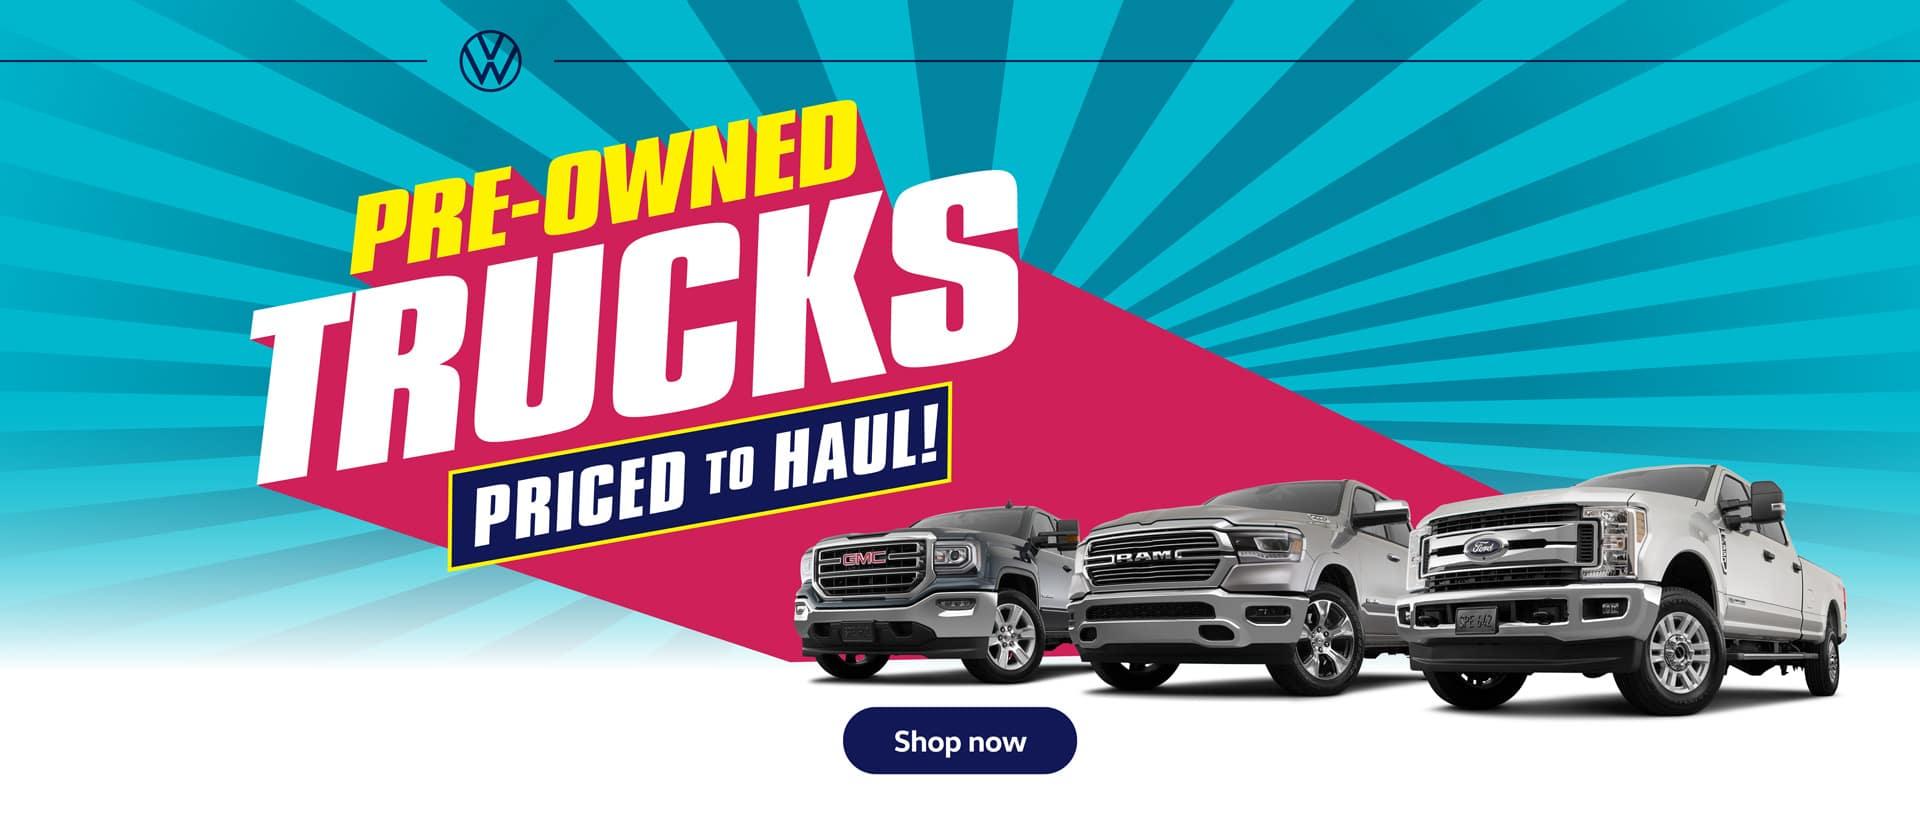 1789701_MRV_Used-Trucks_WB